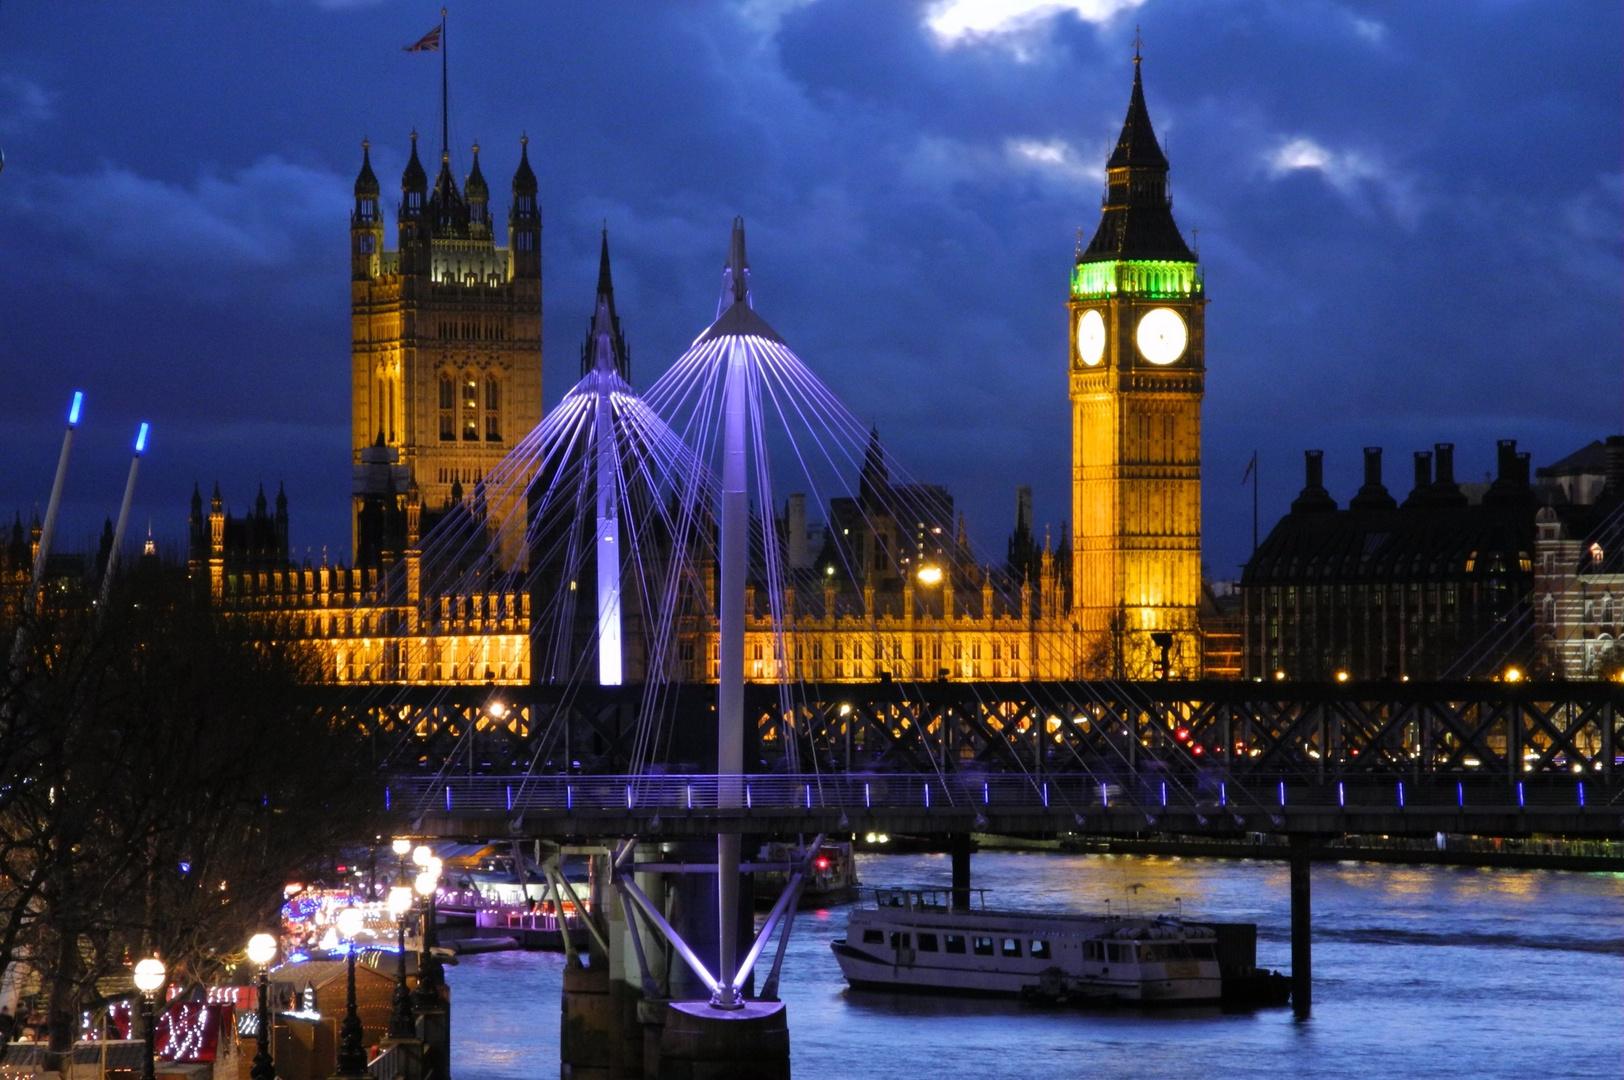 London elithebeth Tower Big Ben